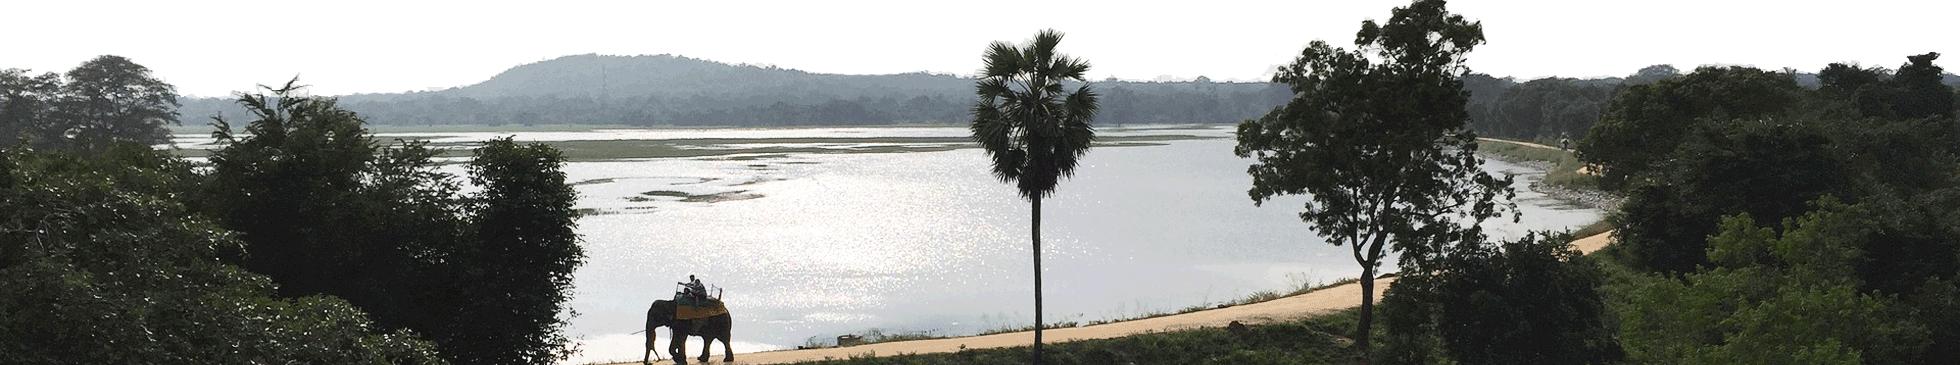 Visuel horizontal voyage Sri Lanka